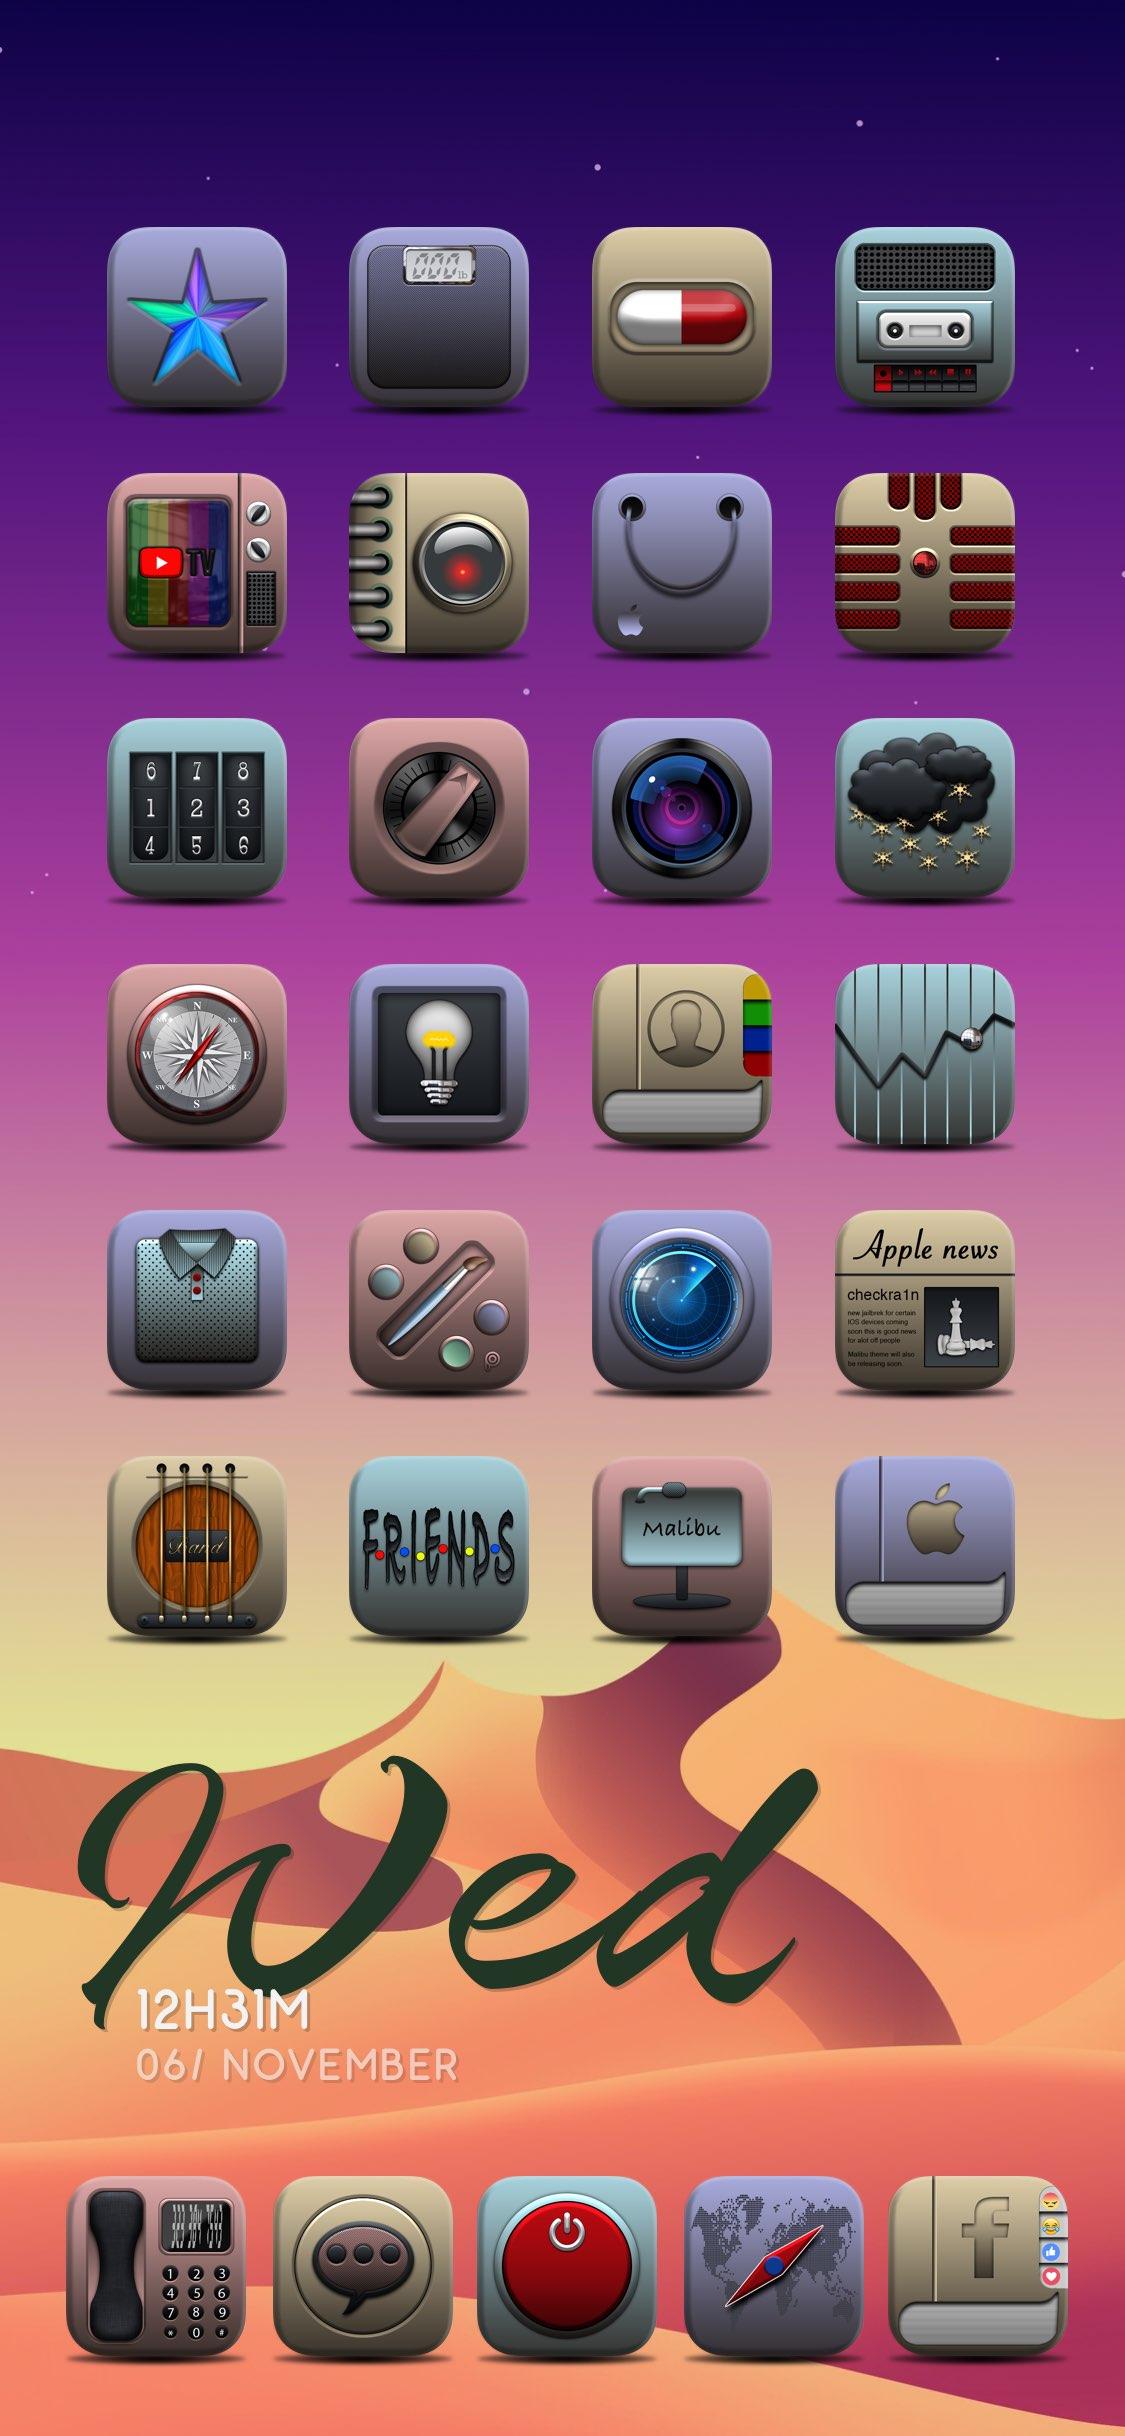 Download Malibu 1.4